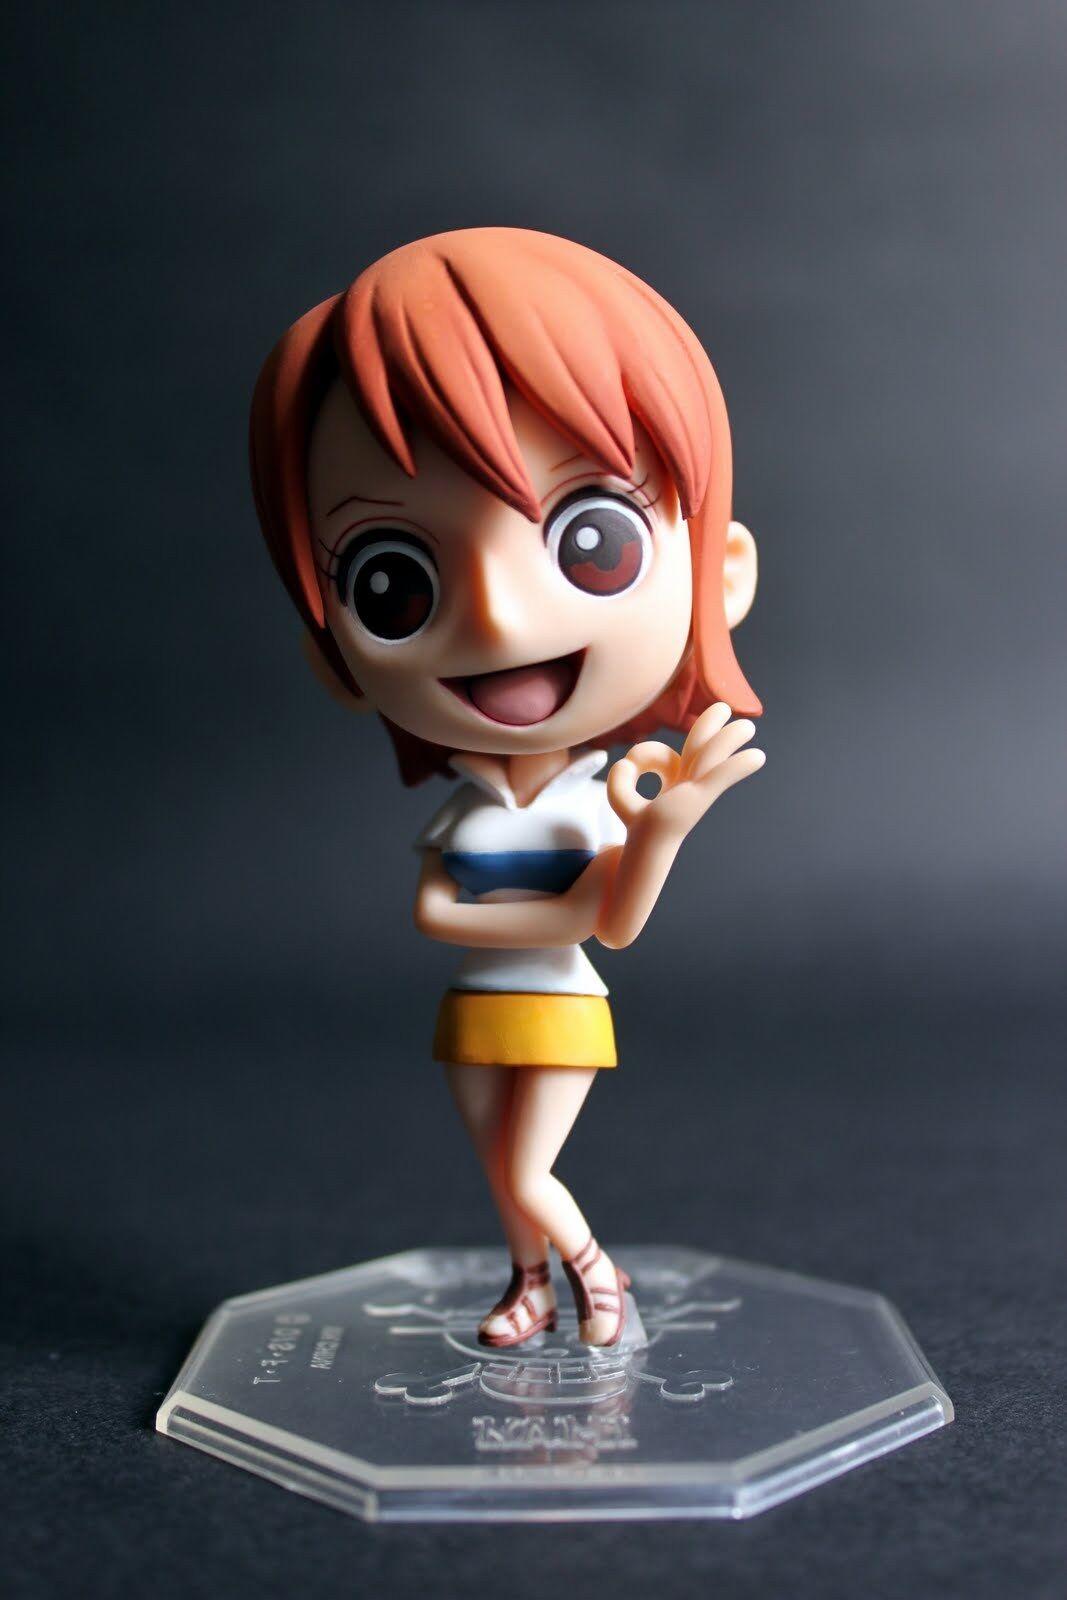 ONE PIECE P.O.P. Mild - Nami - Figure Patriot Of Pirates Megahouse POP